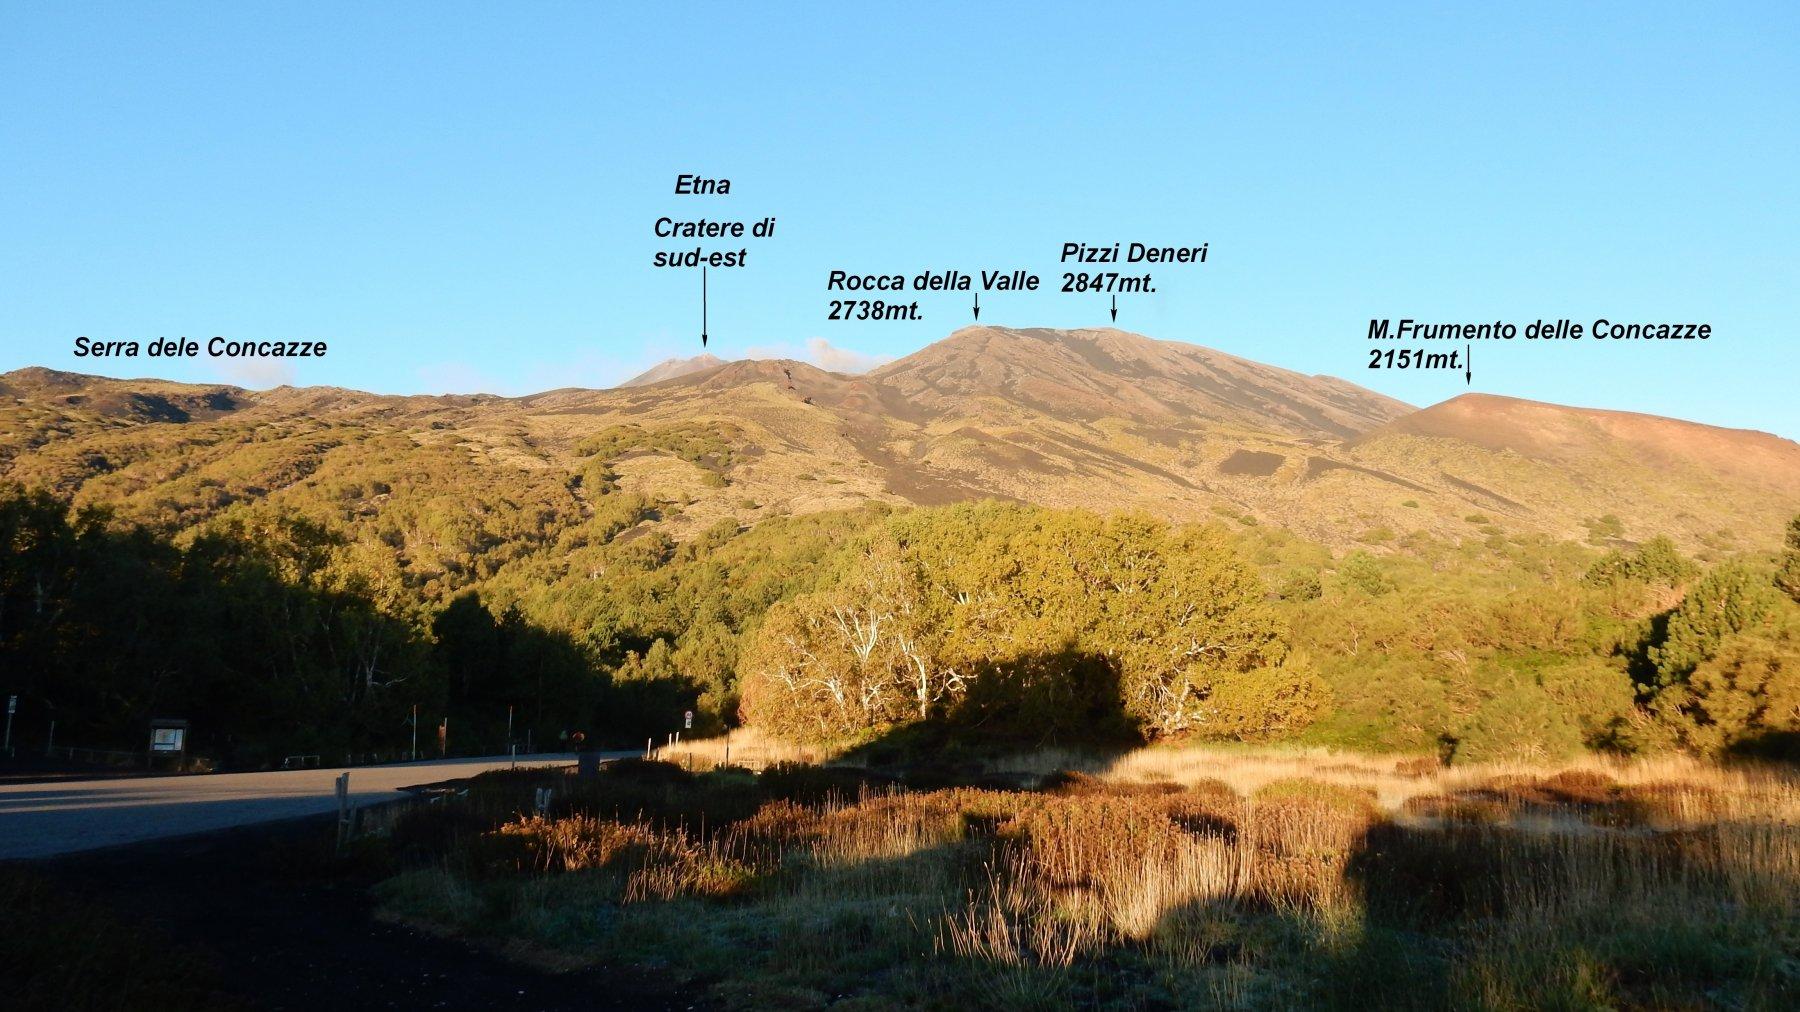 La vista dell'Etna dal Rif.Citelli.